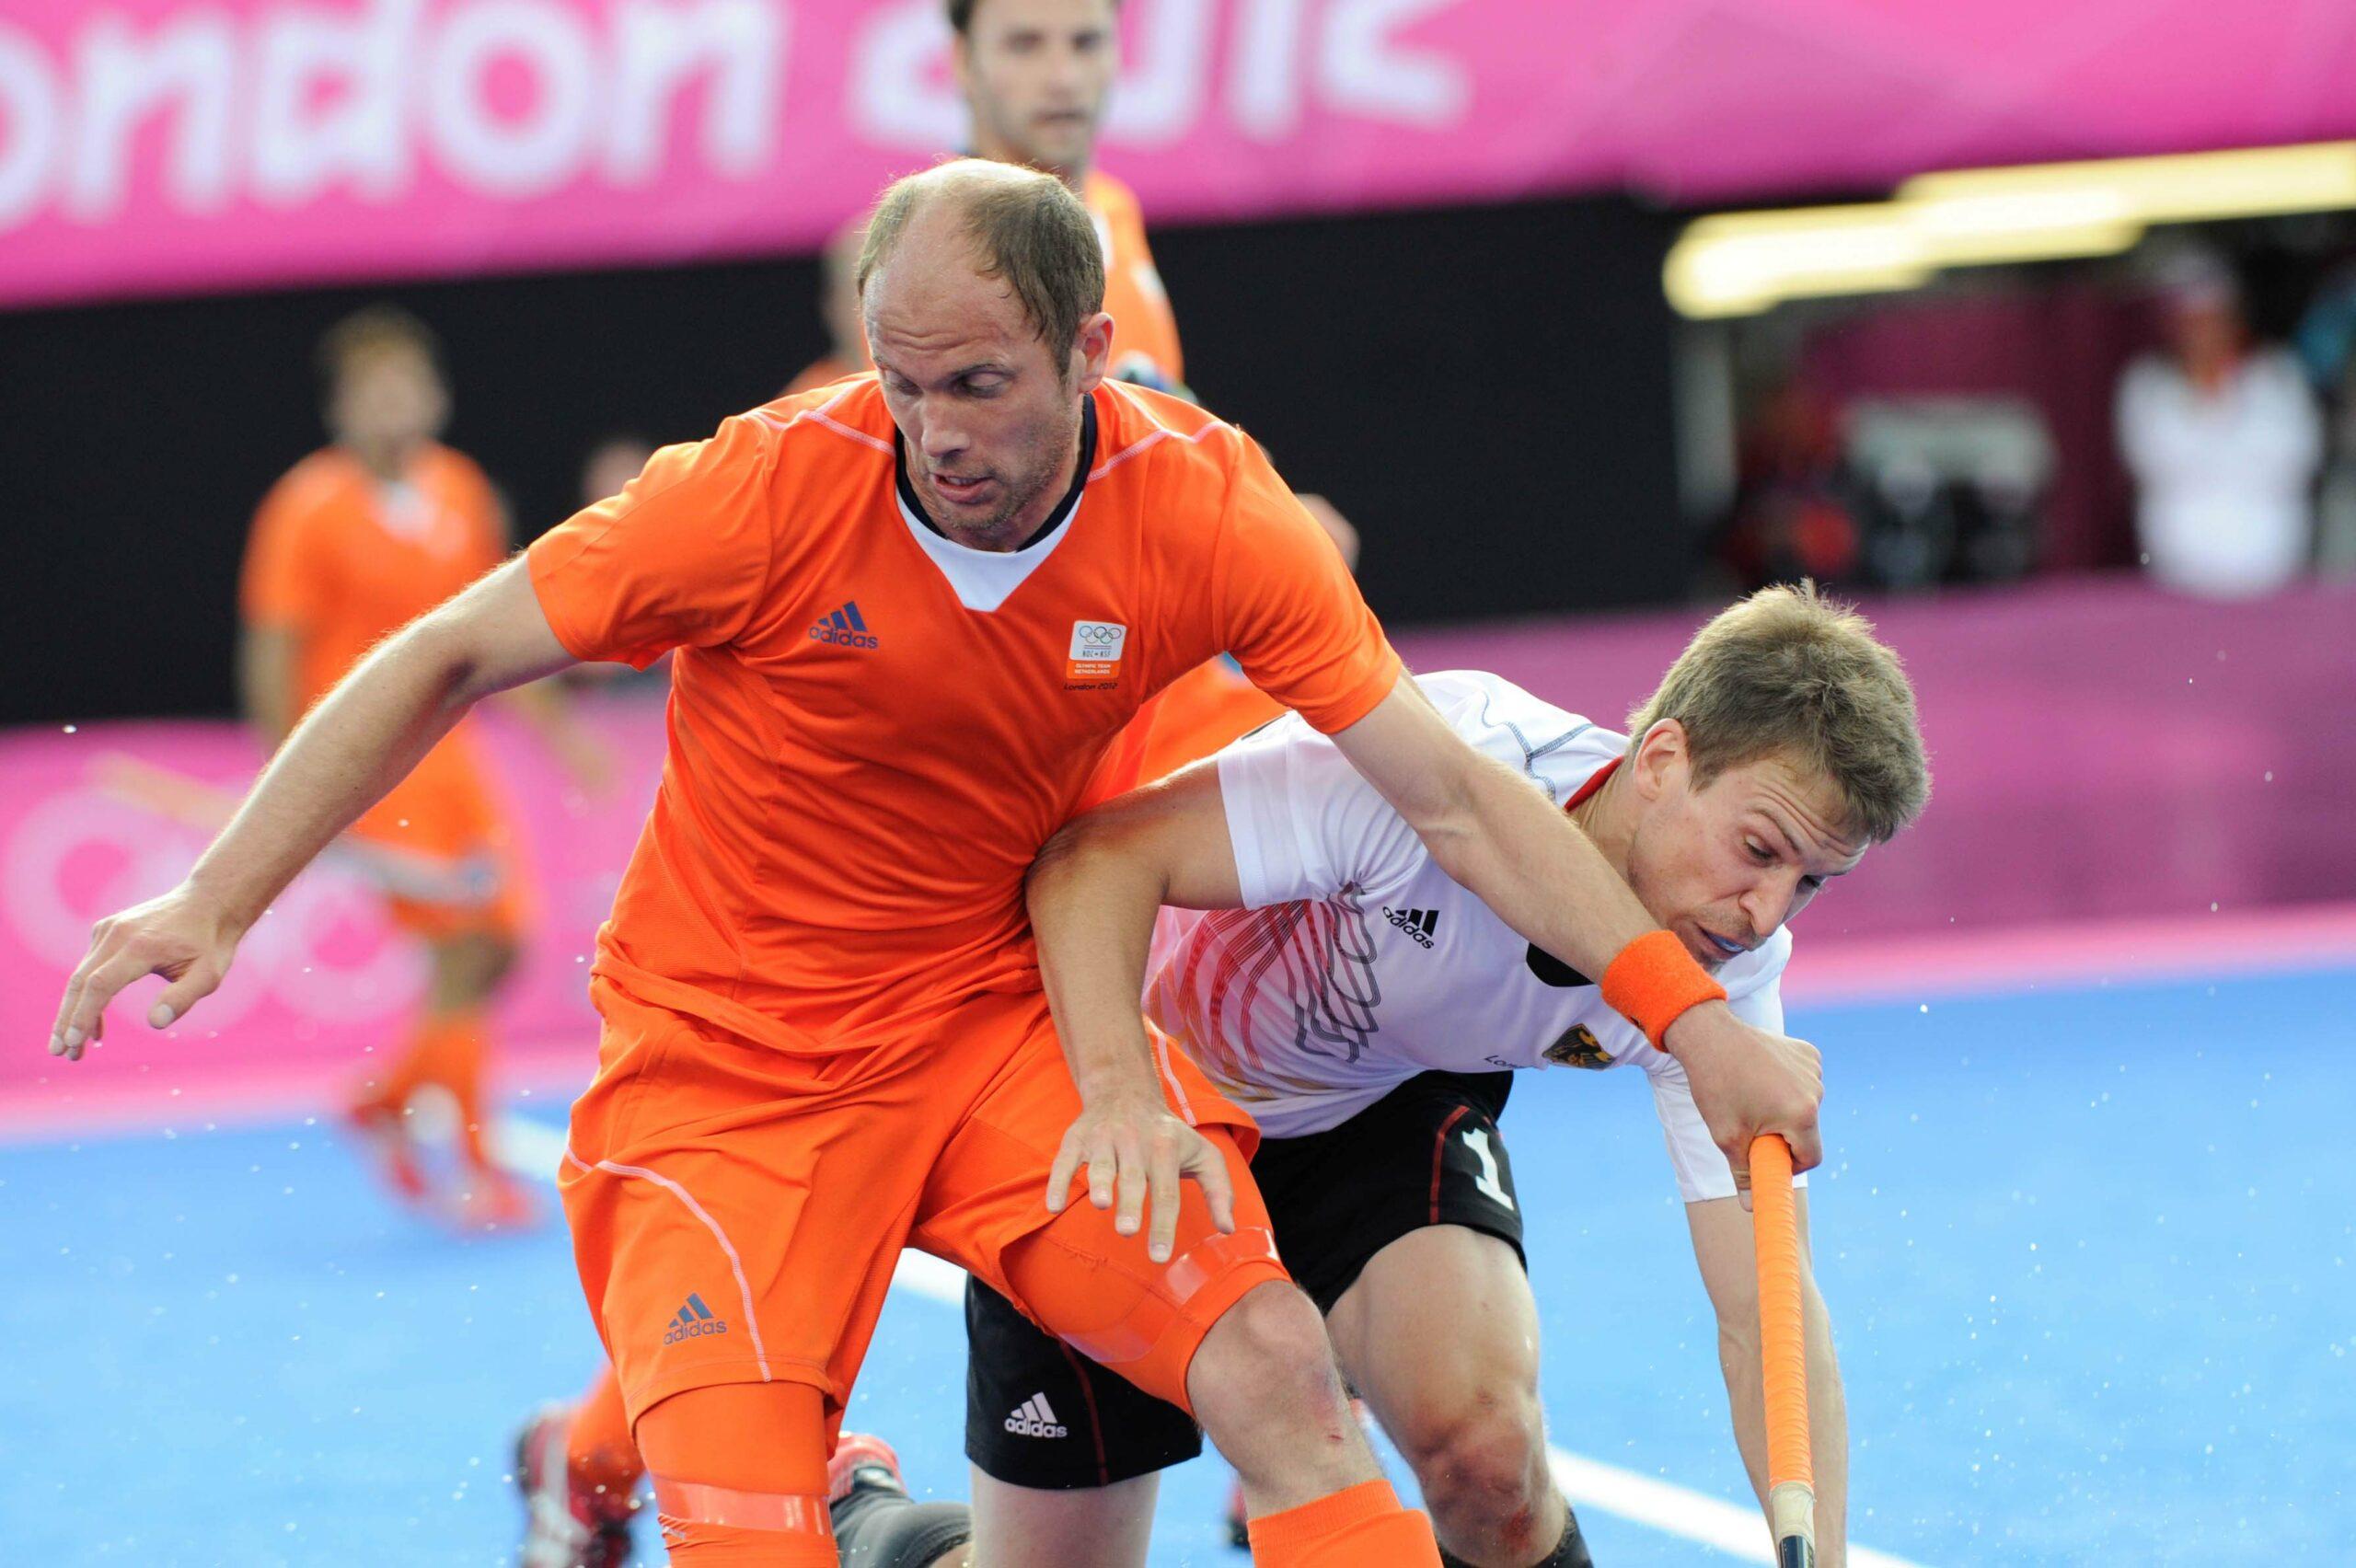 Teun de Nooijer (right) at the 2012 Olympics  (c) hockeyimages.co.uk